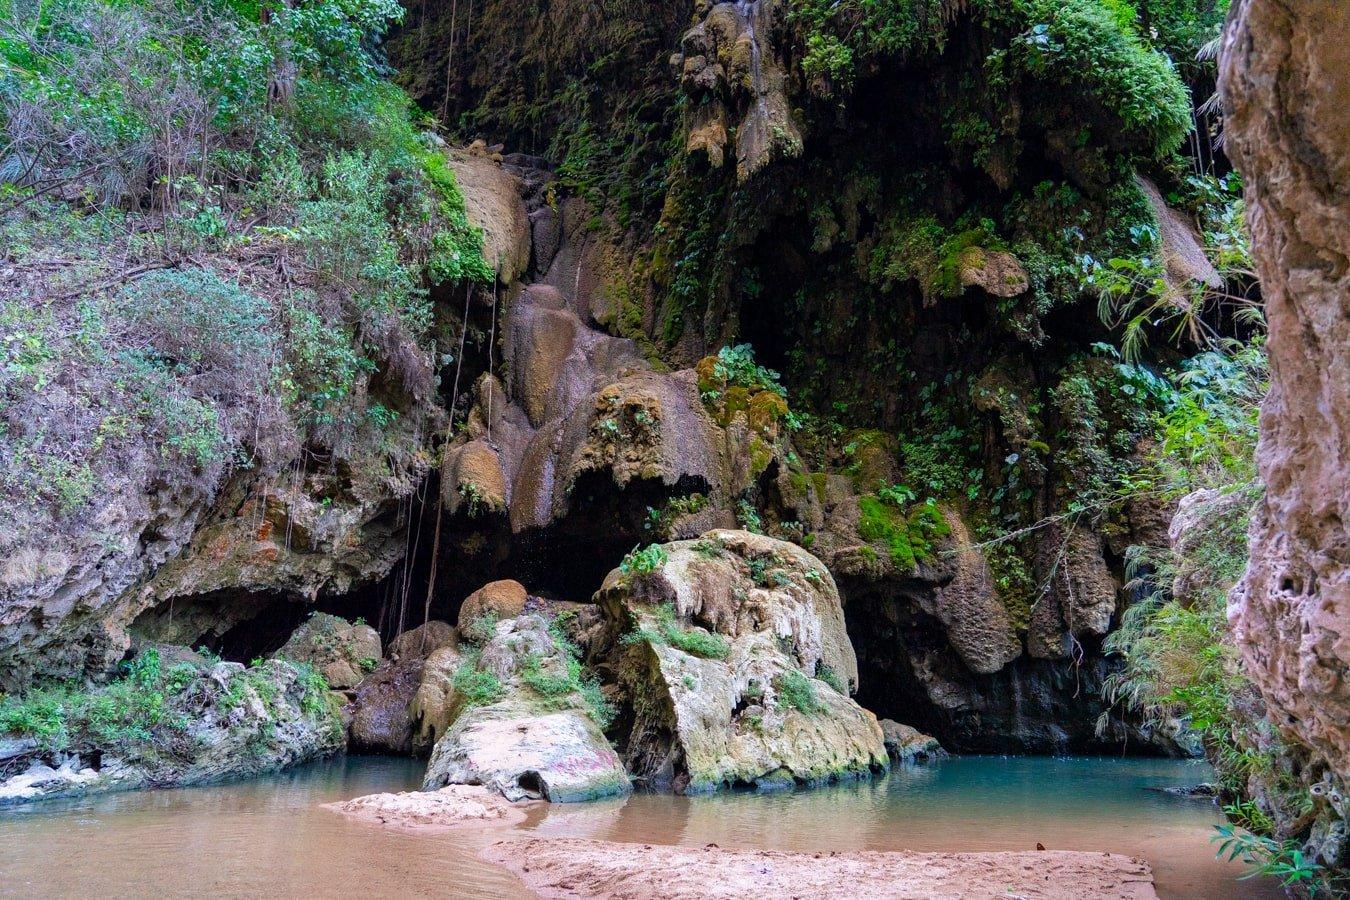 blue swimming hole at el aguacero inside rio la venta canyon river